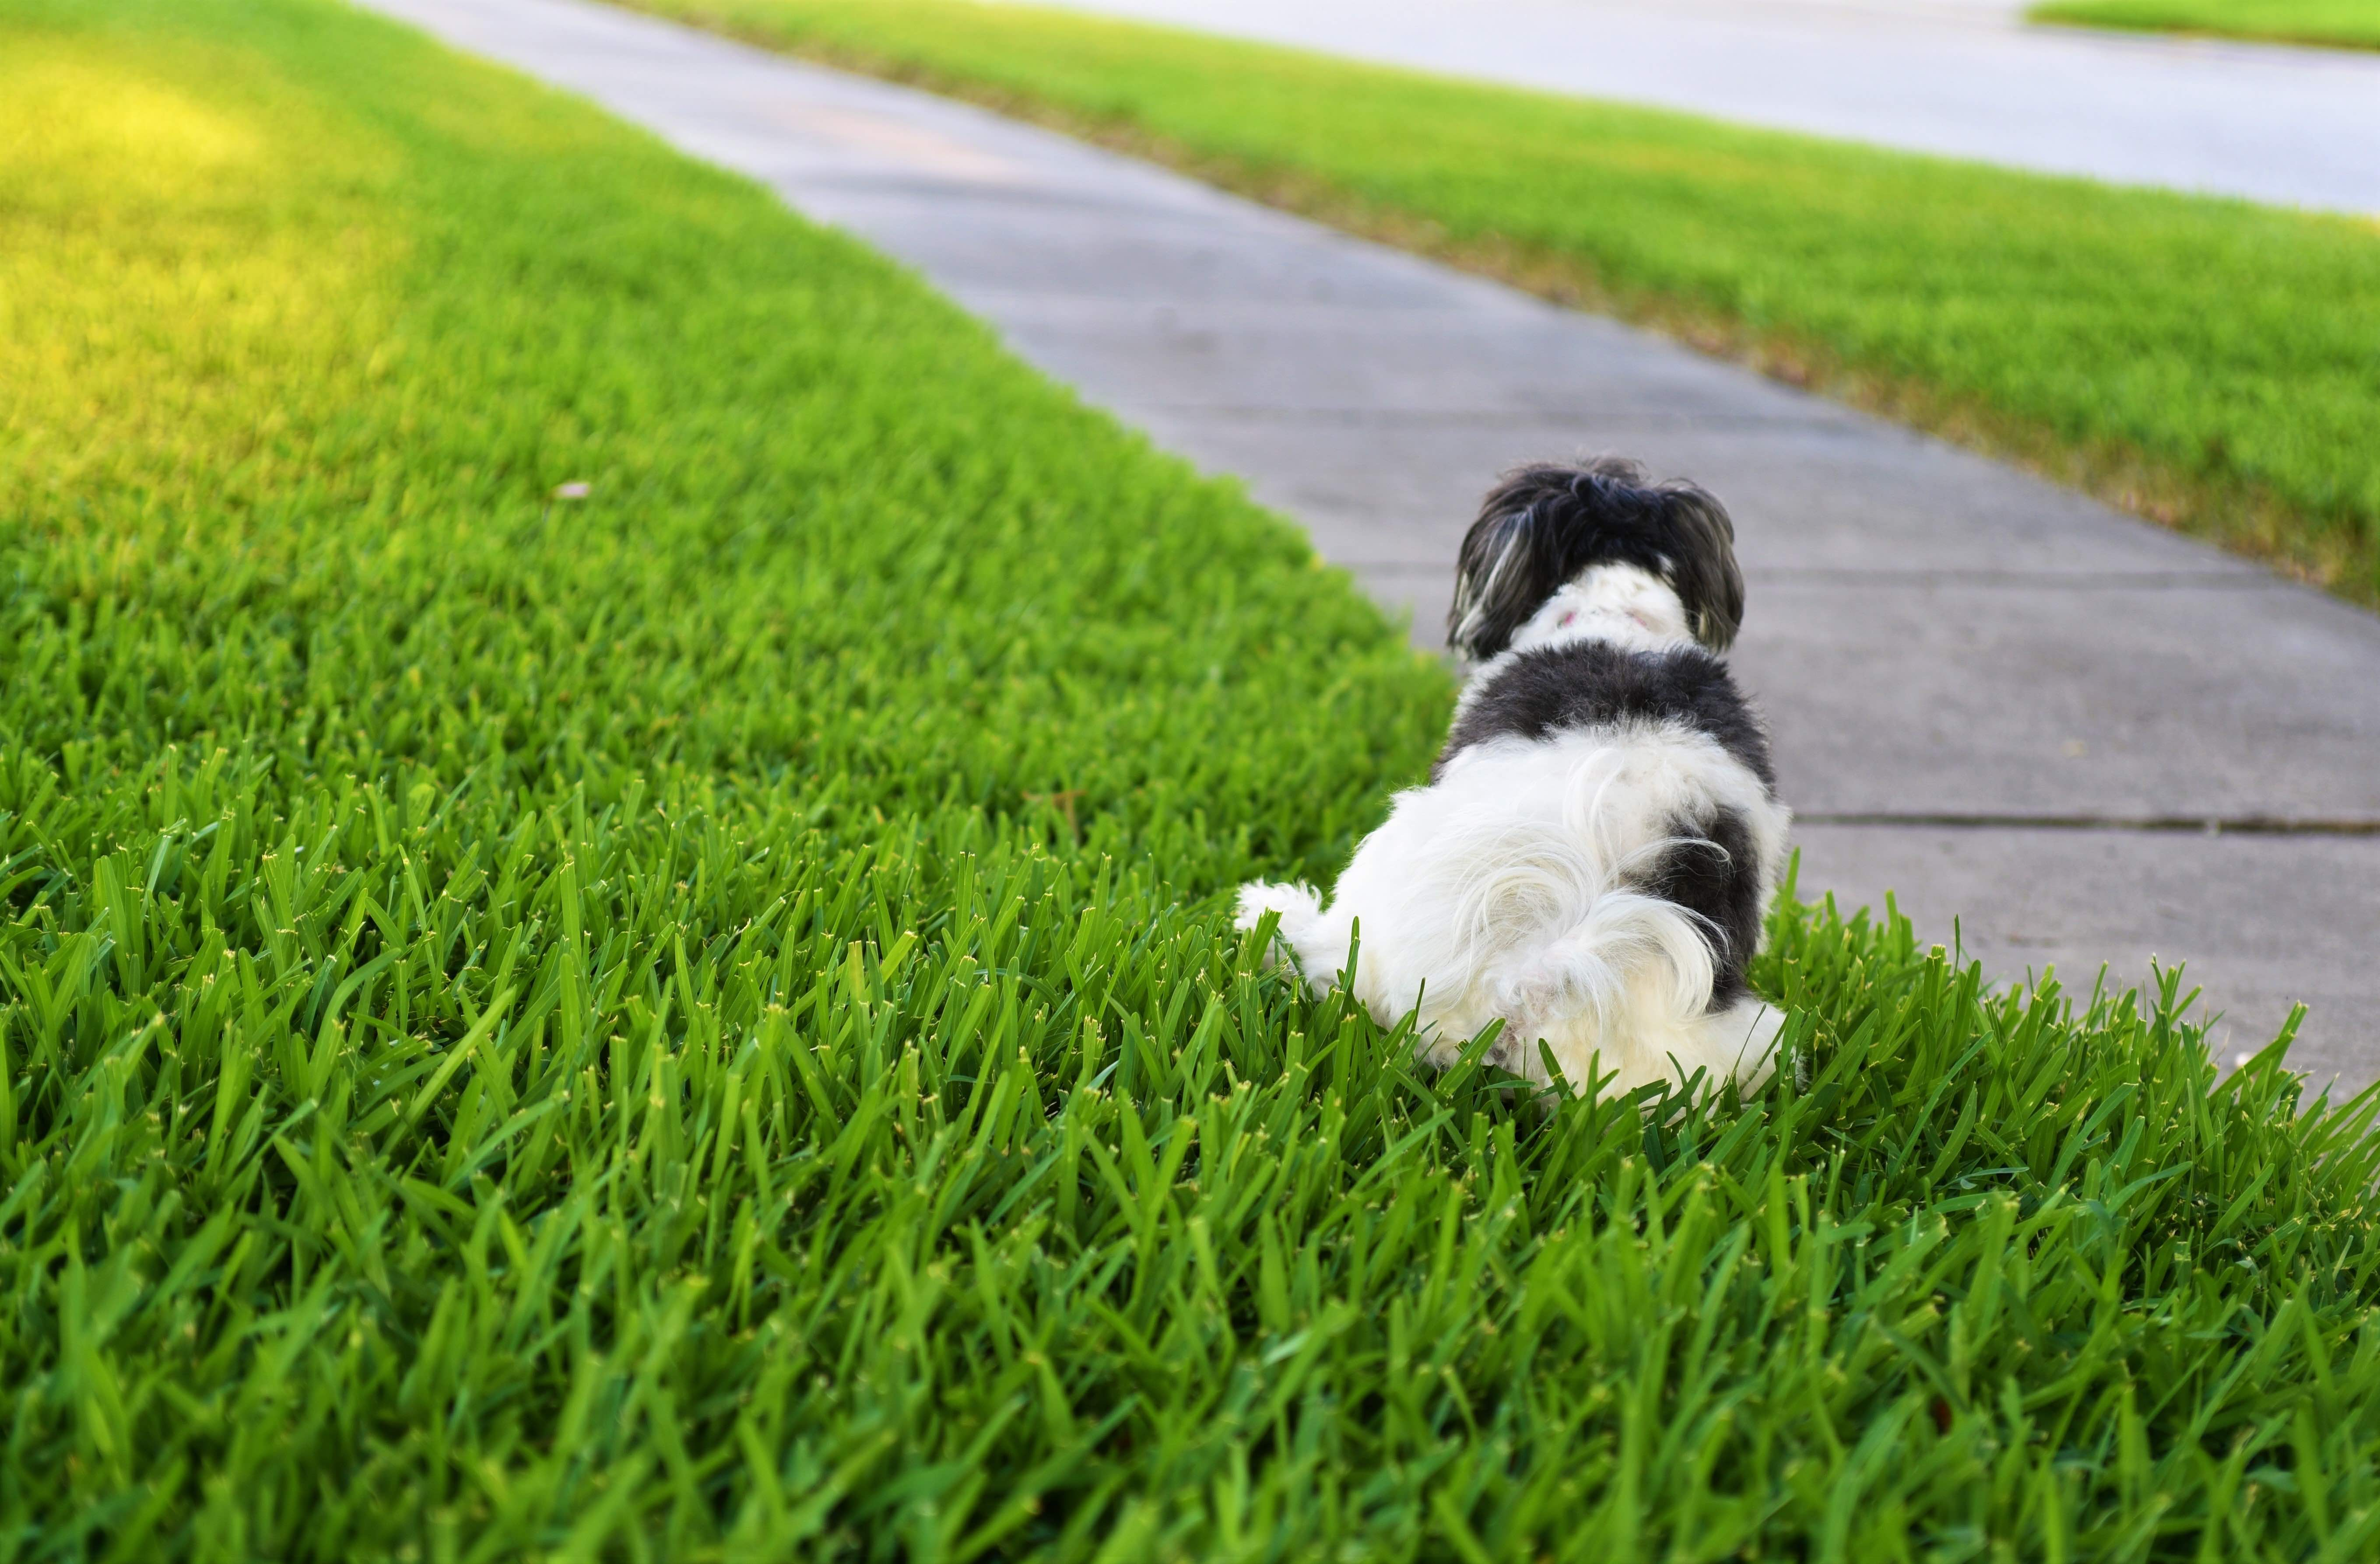 Adopting a housebroken dog